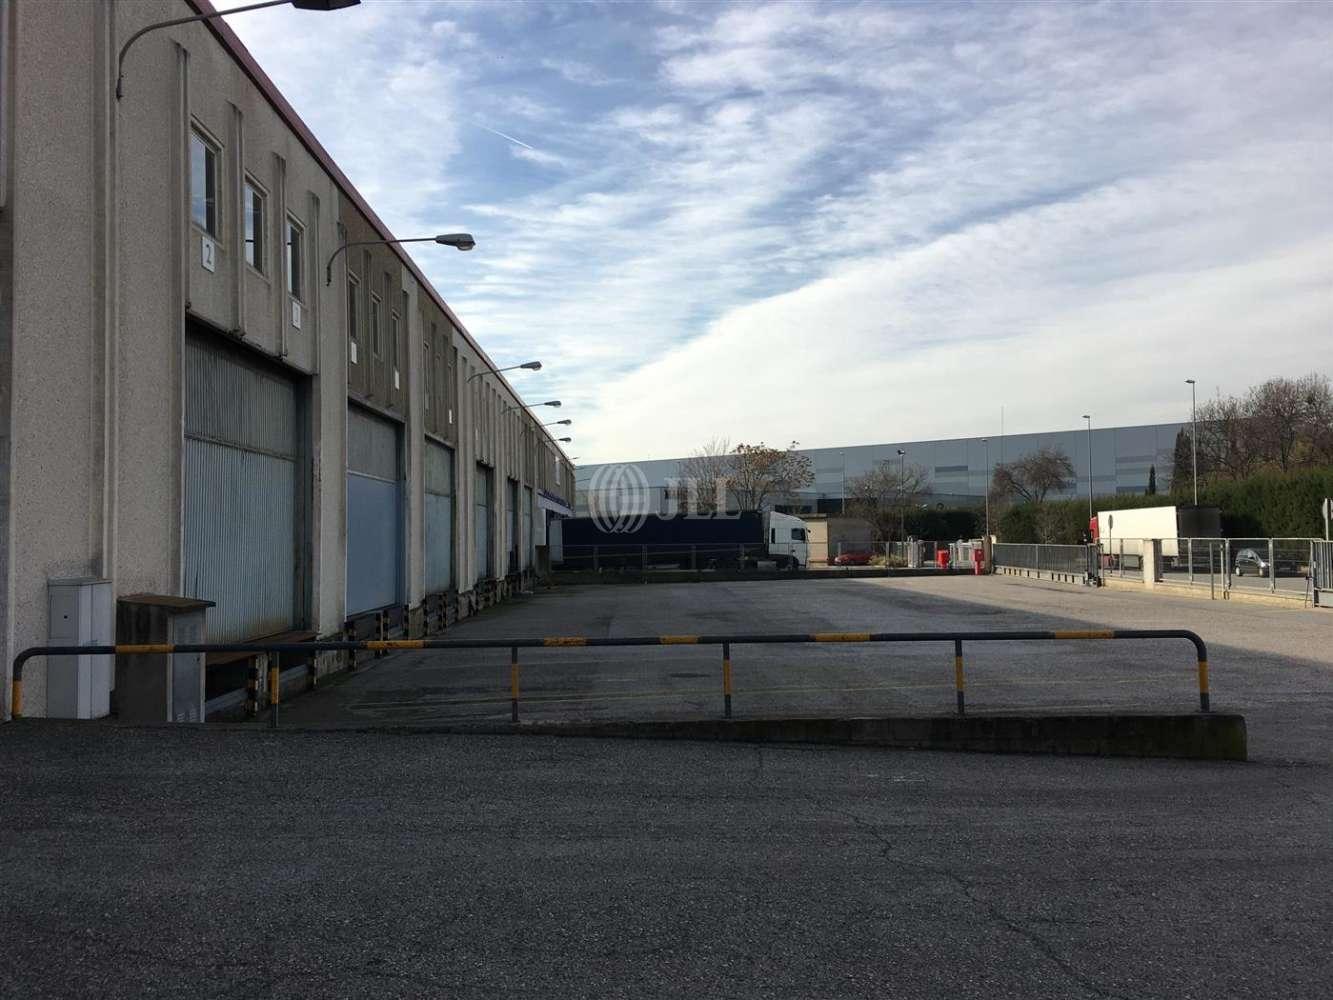 Naves industriales y logísticas Parets del vallès, 08150 - Nave Industrial - B0131 P.I CAN VOLART